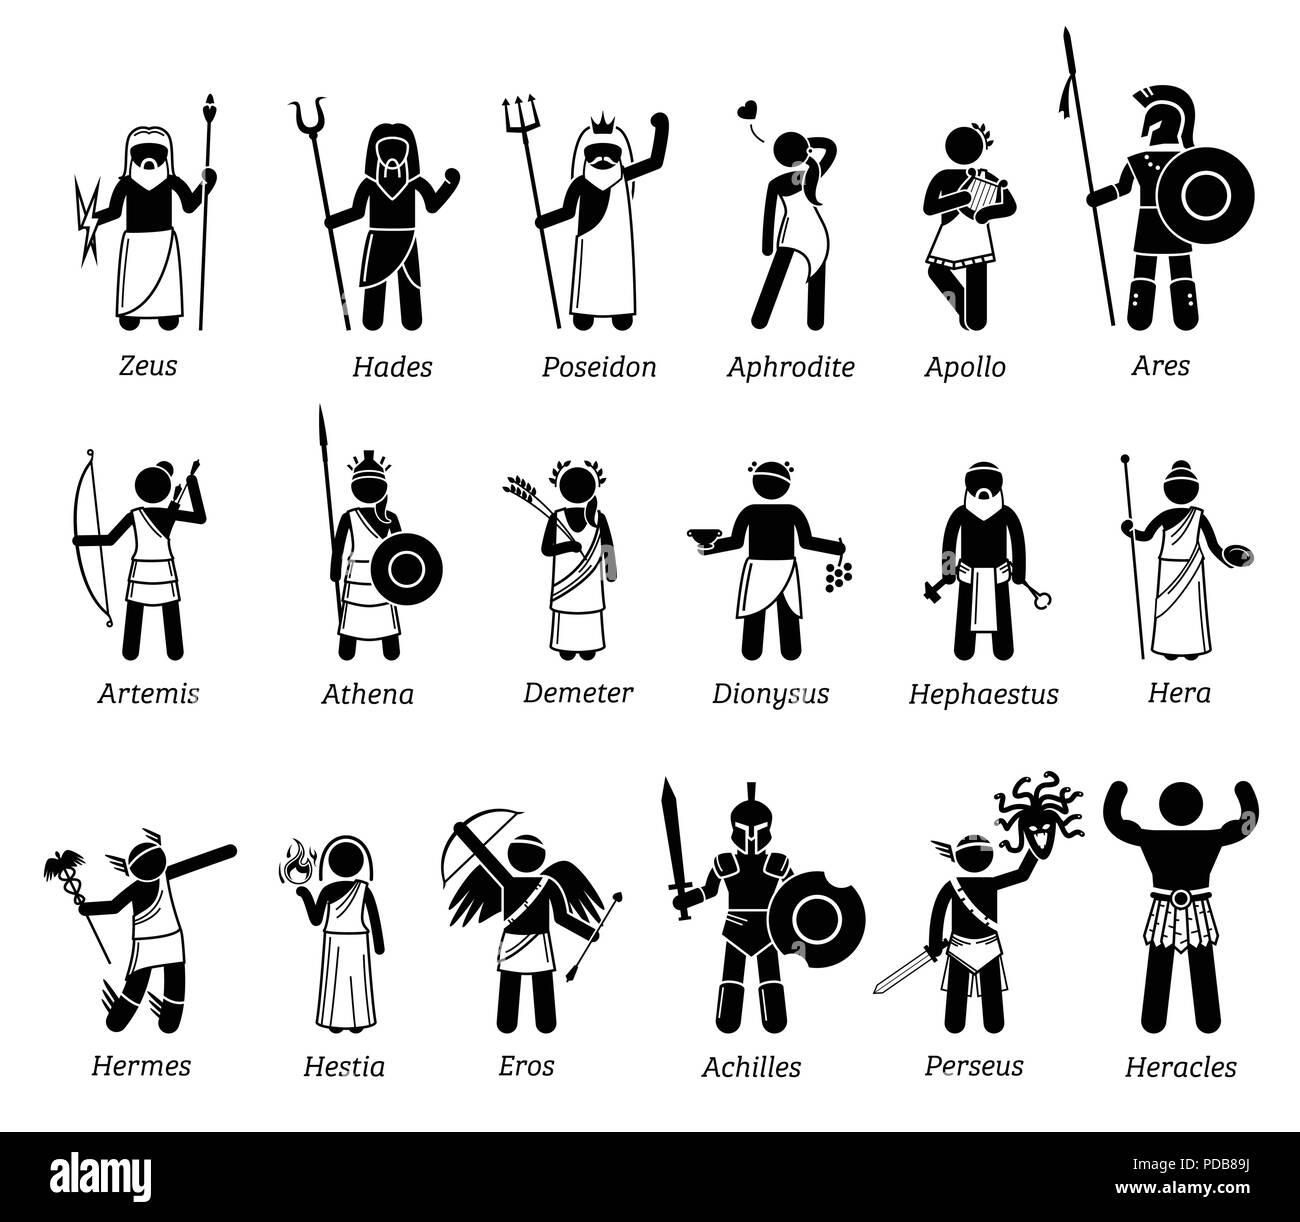 Ancient Greek Mythology Gods And Goddesses Characters Icon